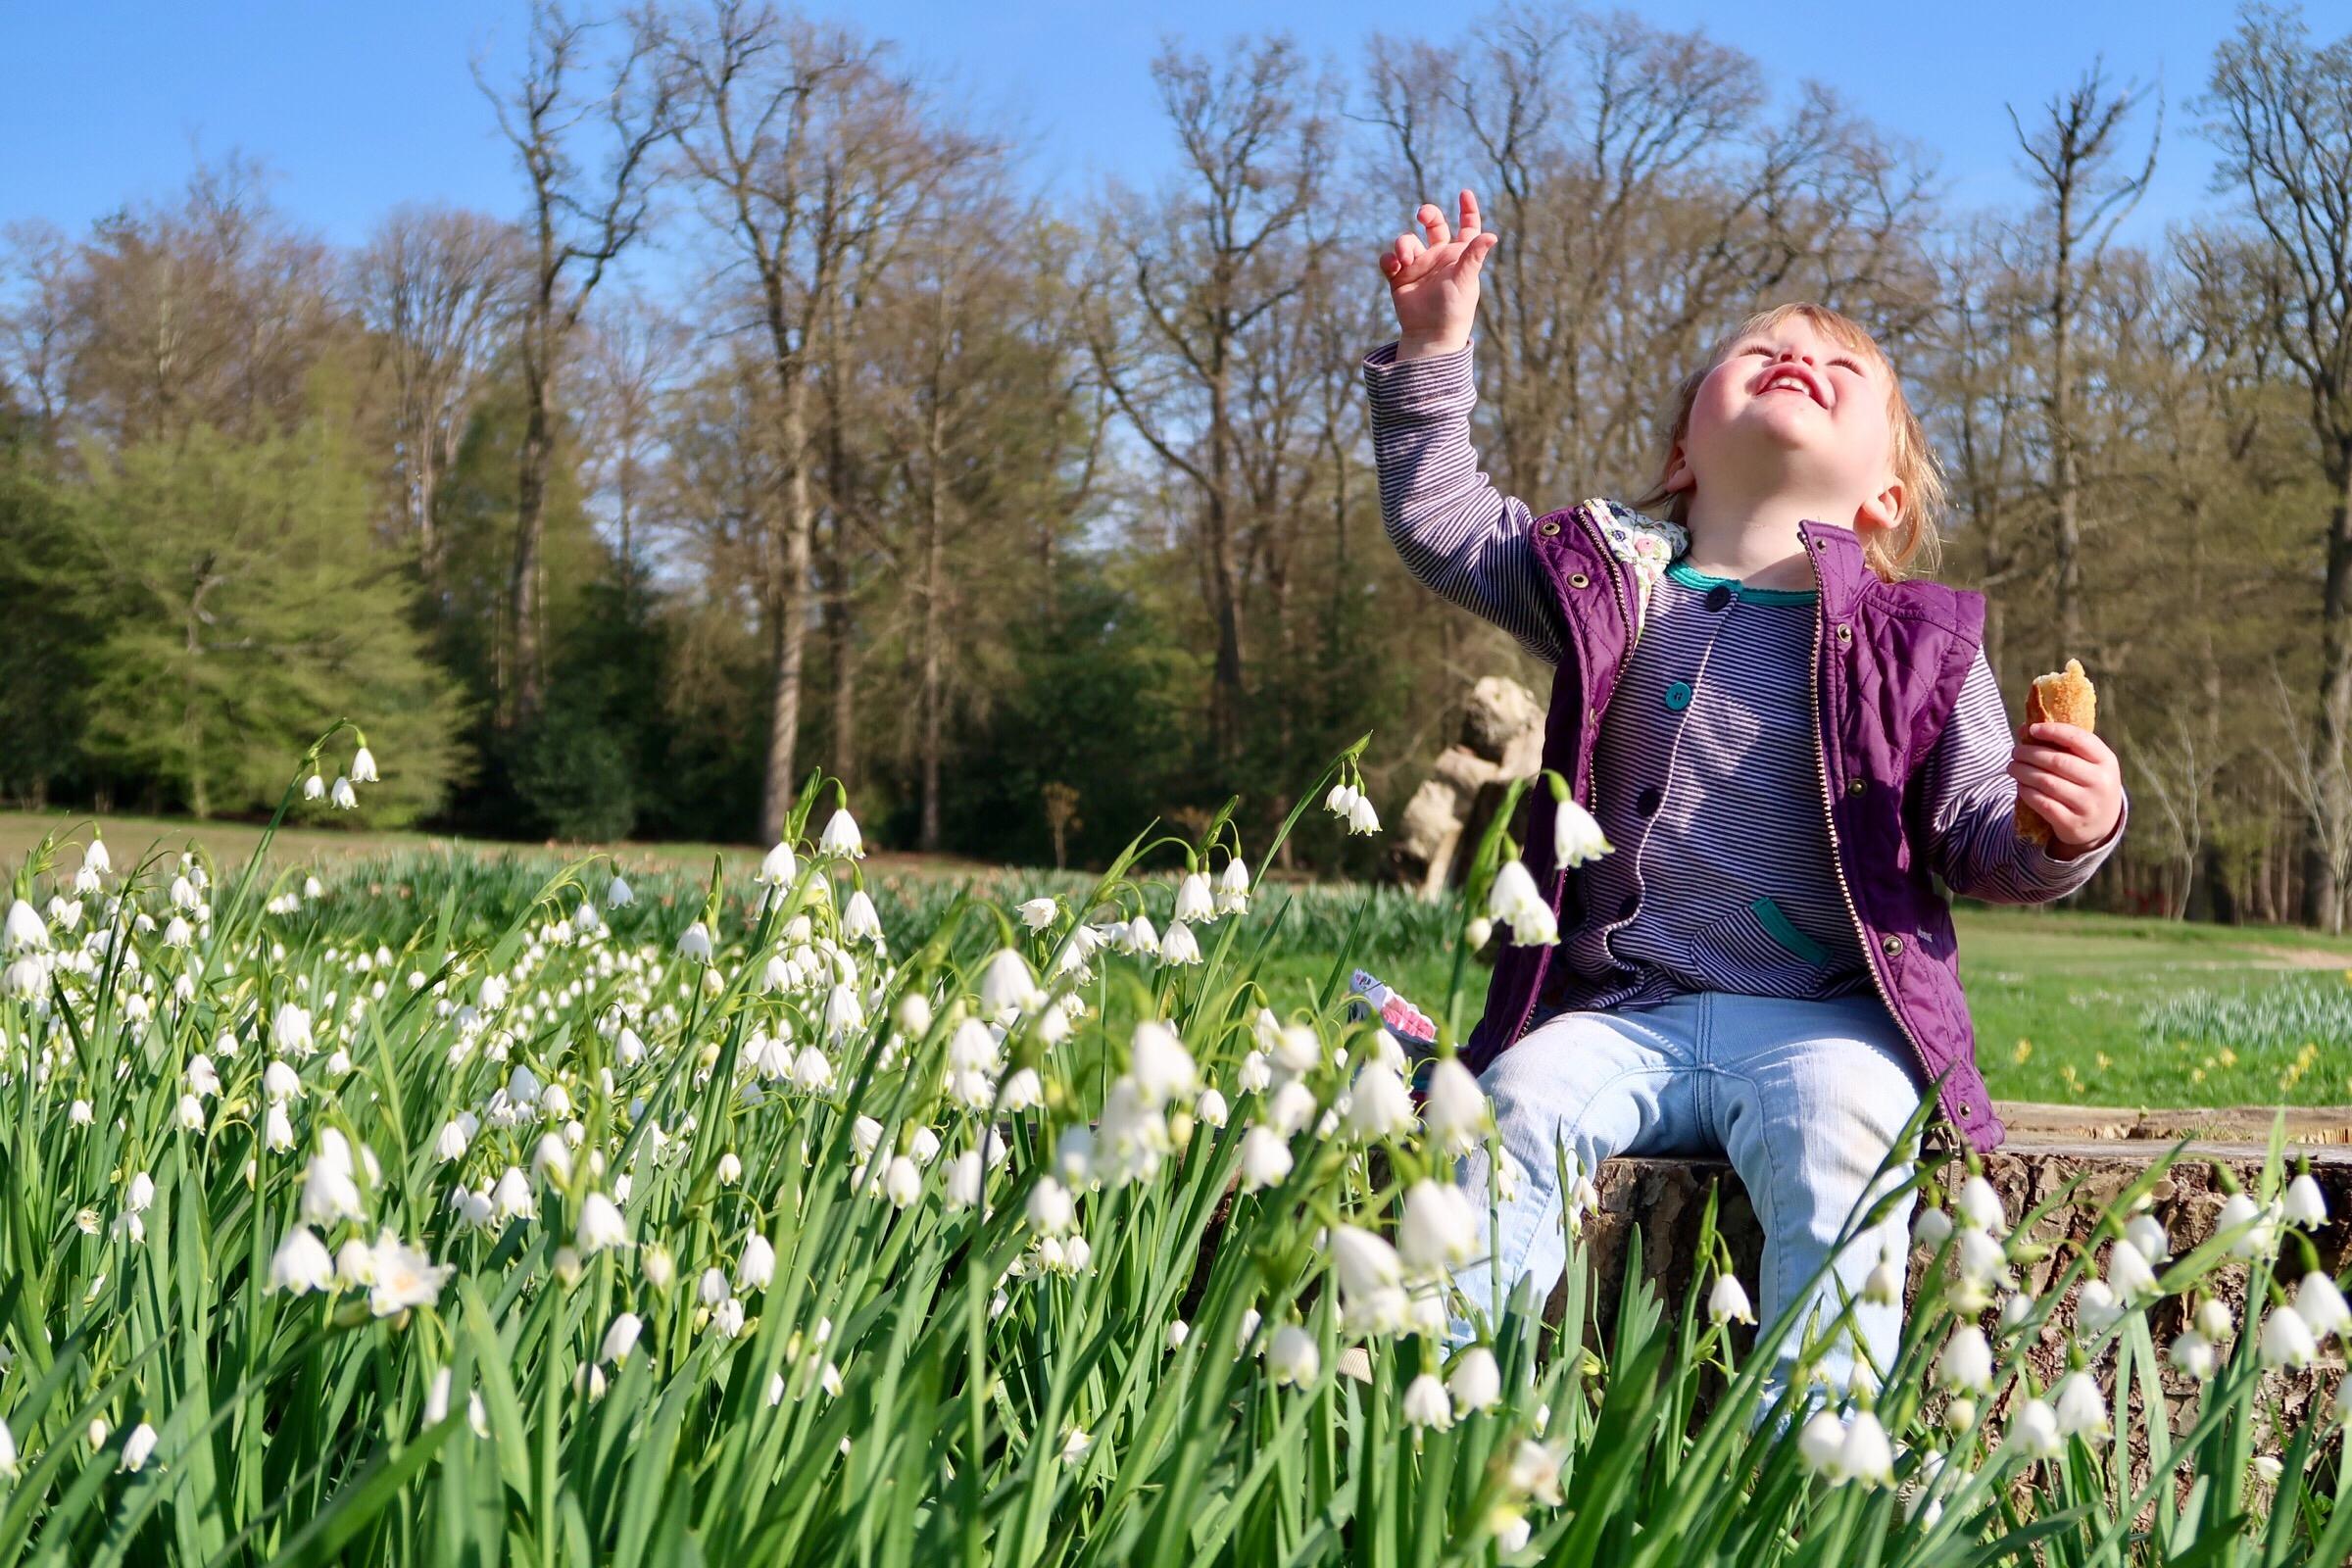 Enjoying Spring at Thoiry Zoo, near Paris